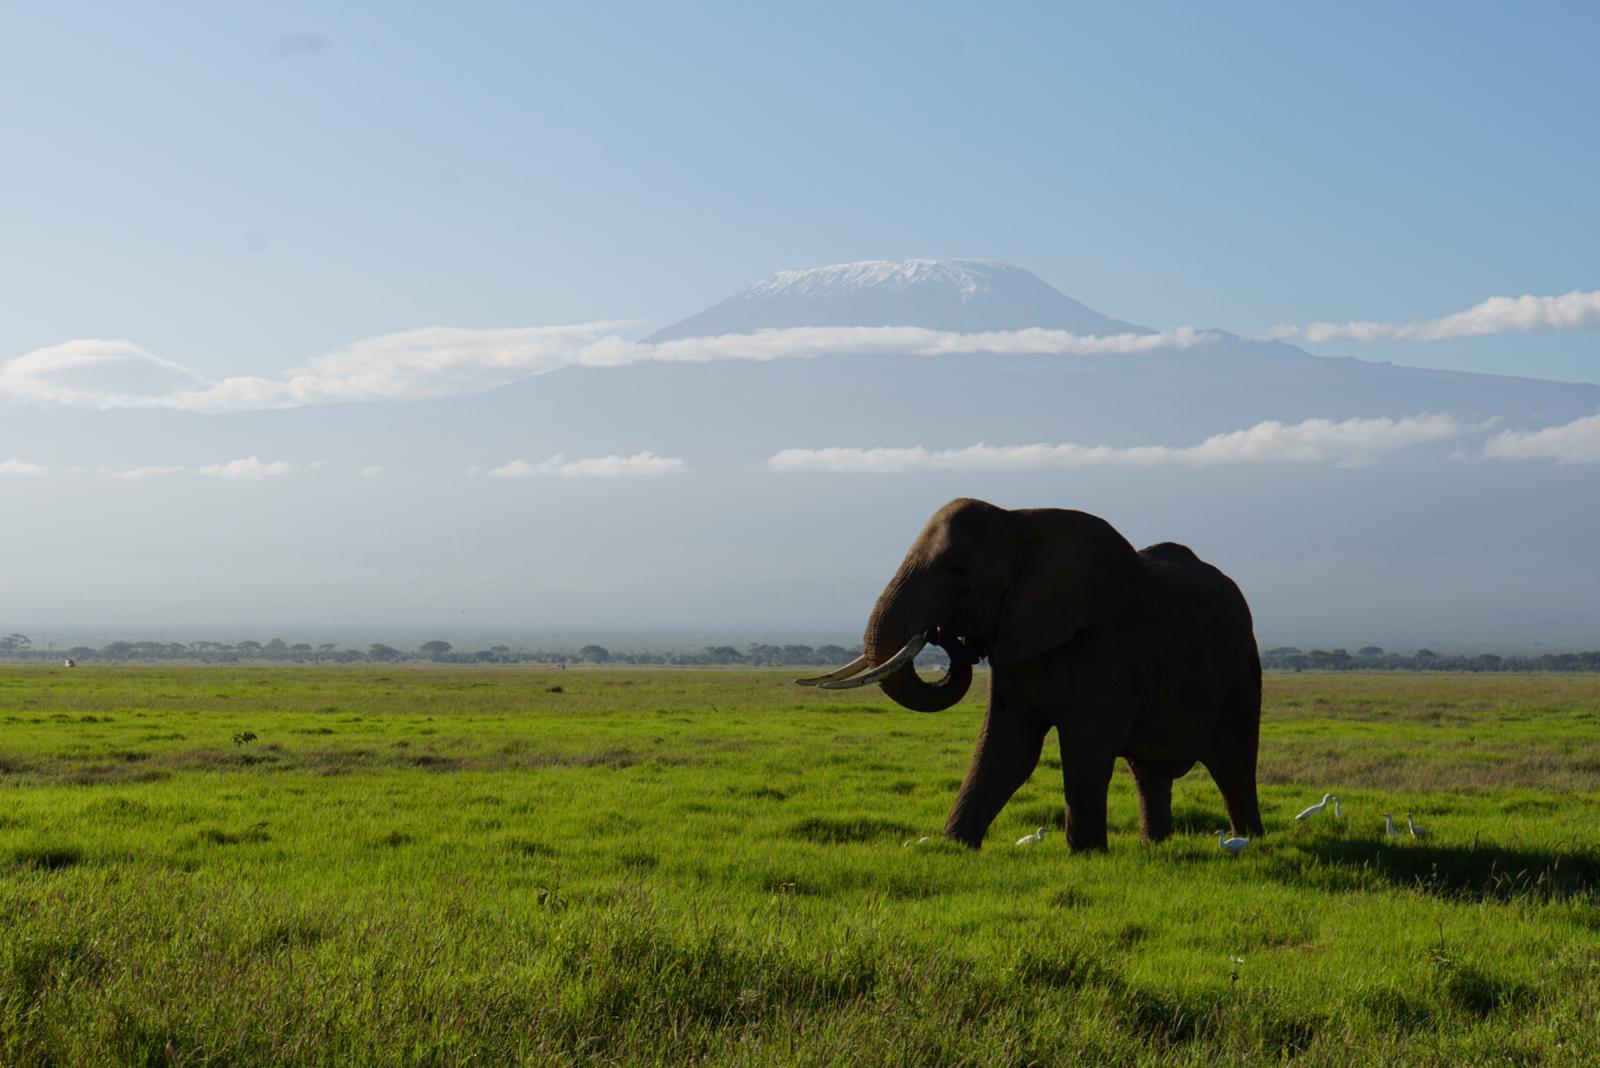 elefante en amboseli con el monte kilimanjaro de fondo